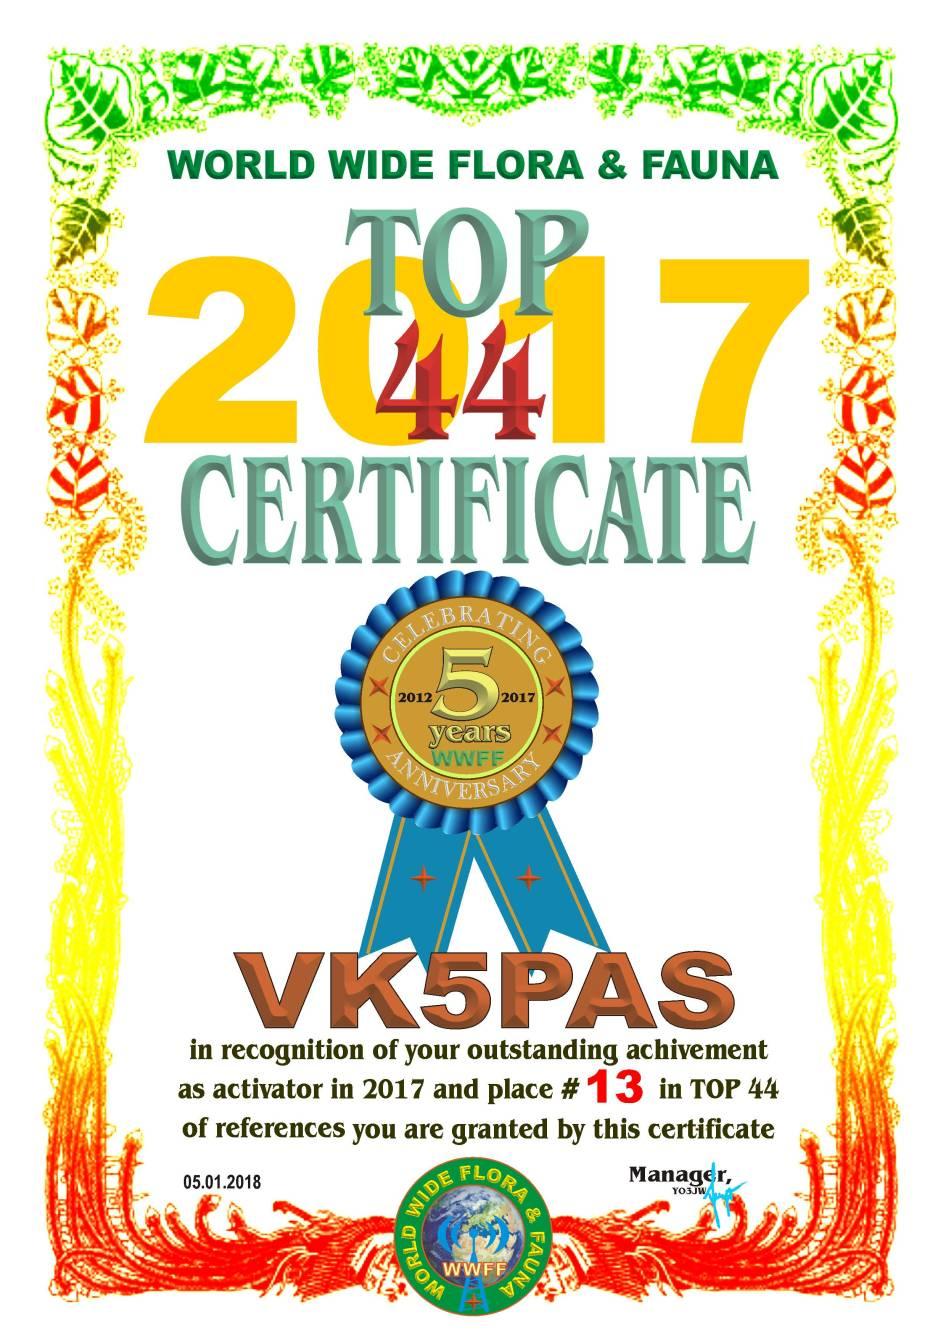 VK5PAS TOP 44 2017 REFERENCES.jpg